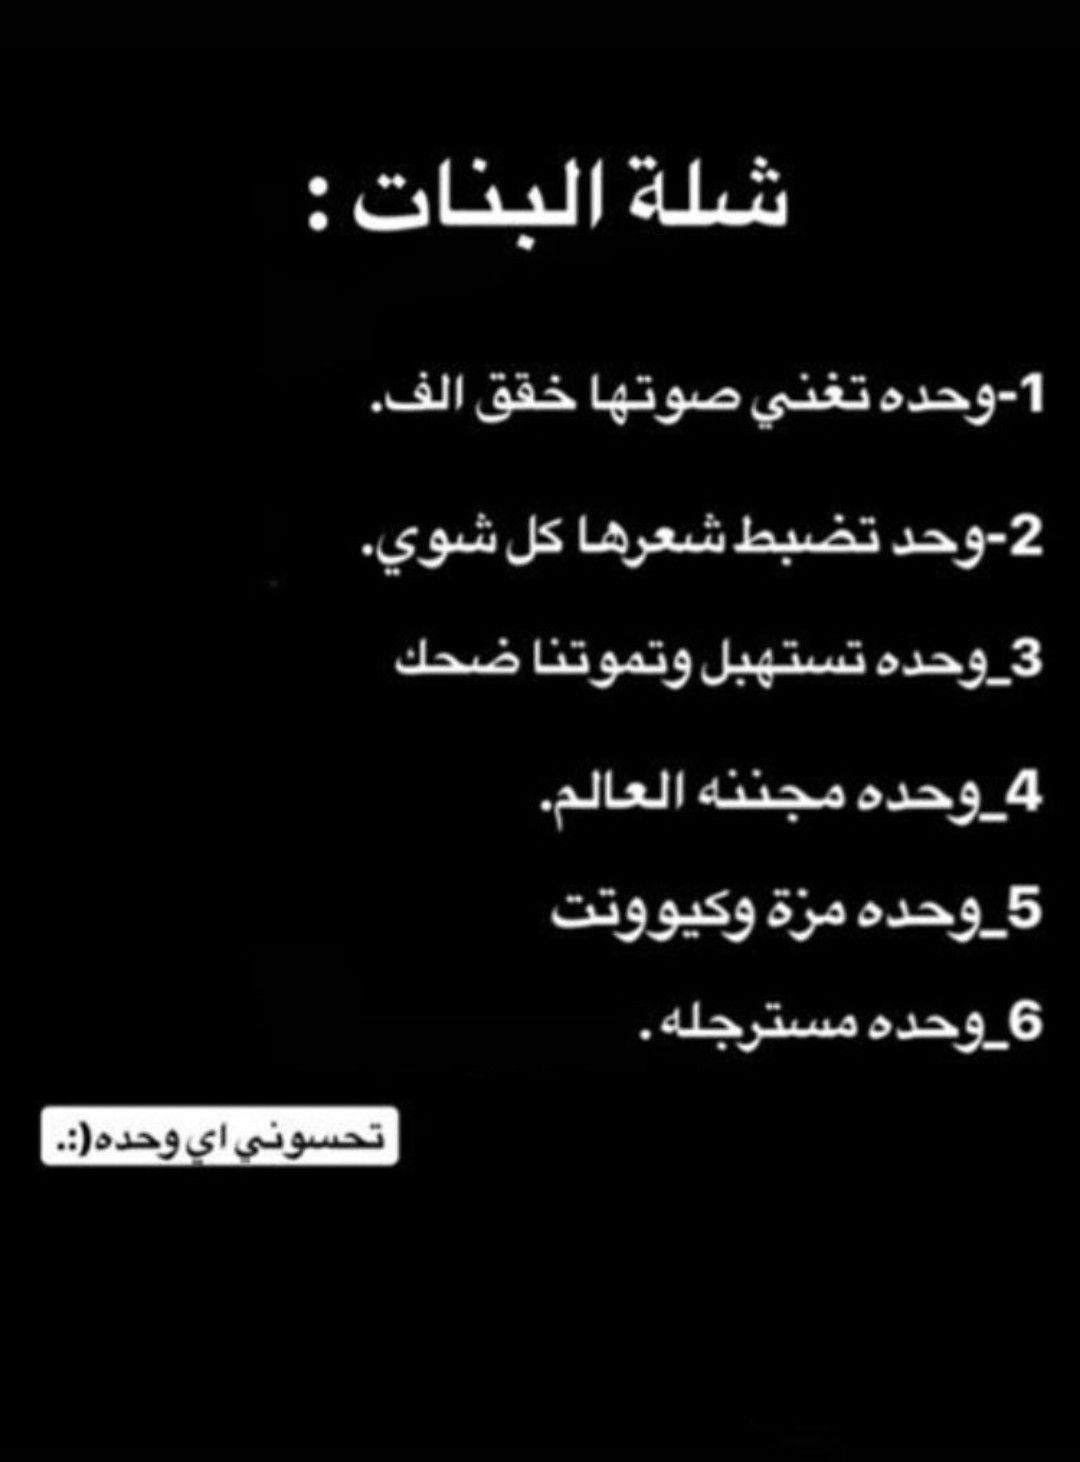 احس اني ٢ او ٣ مدري أصبرو اتأكد من صديقاتي Jokes Quotes Funny Words Funny Arabic Quotes